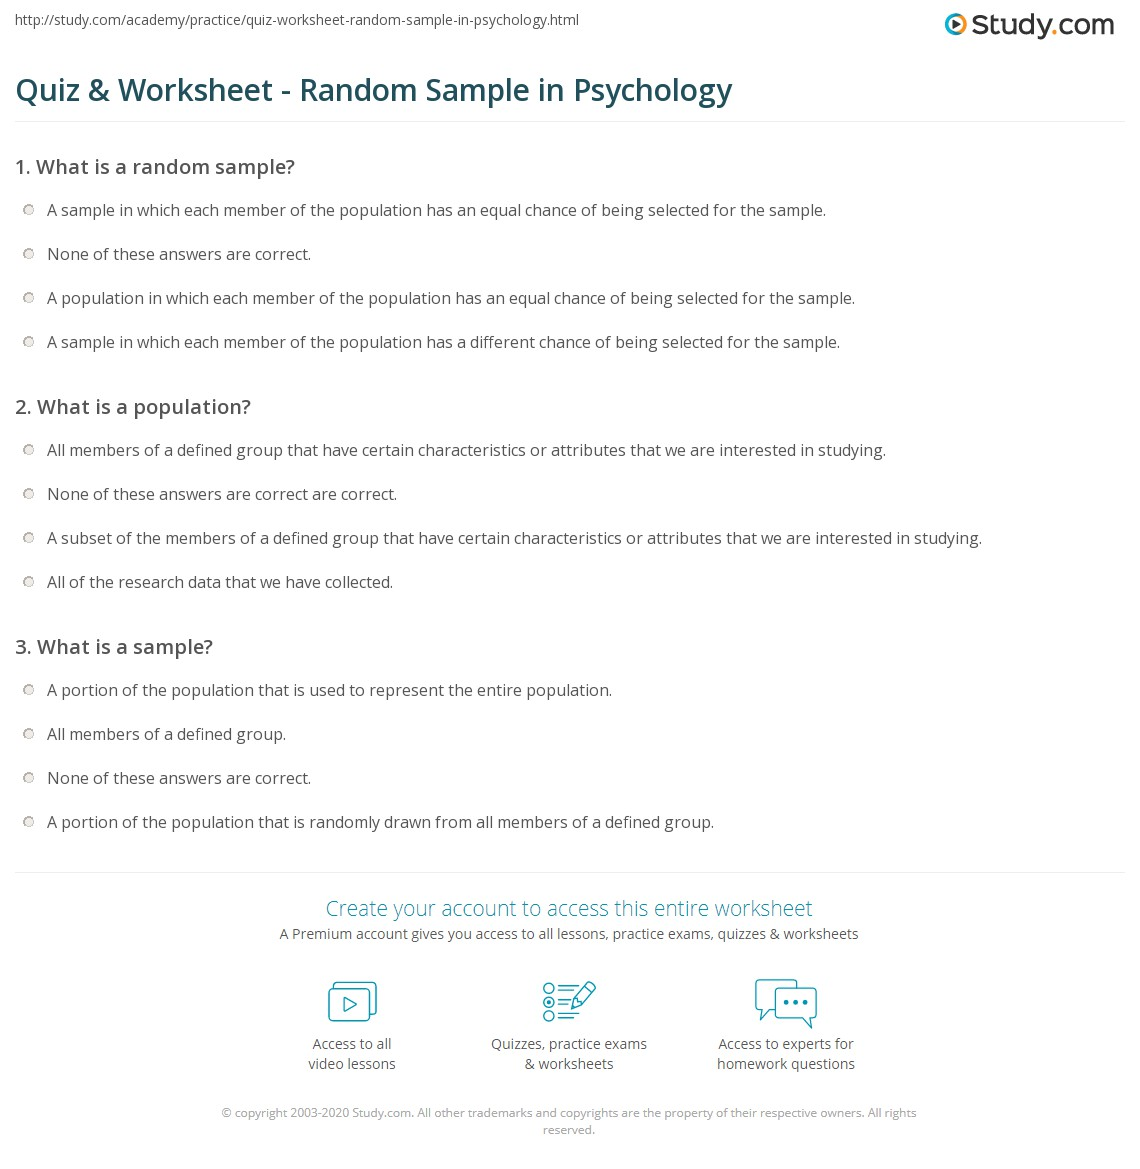 Quiz & Worksheet - Random Sample in Psychology | Study.com